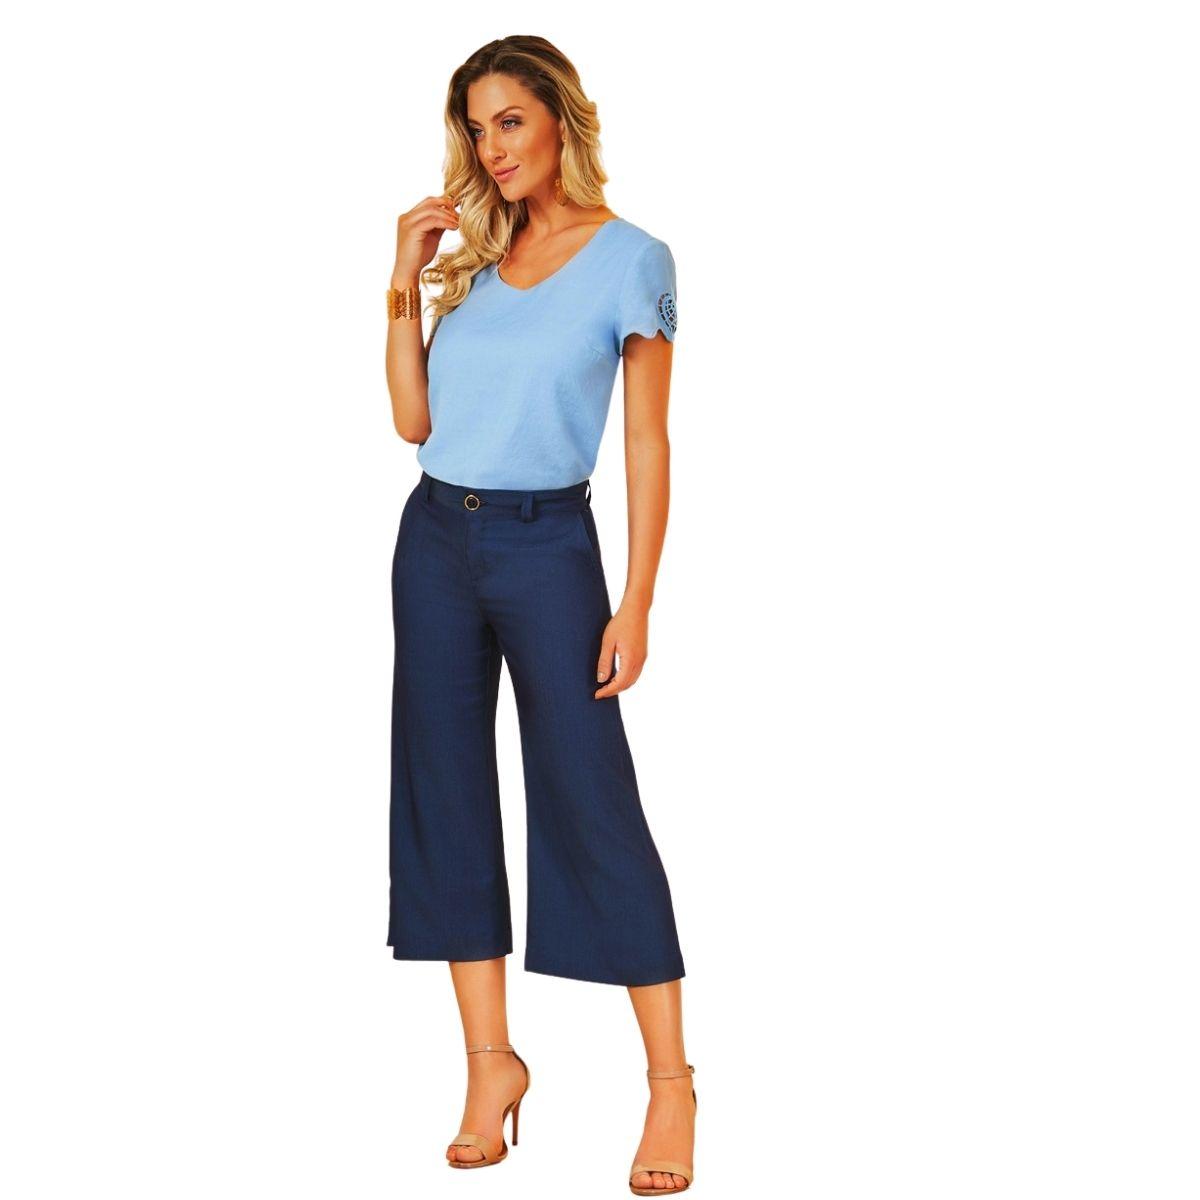 Calça pantacourt feminina cintura alta jeans plus size